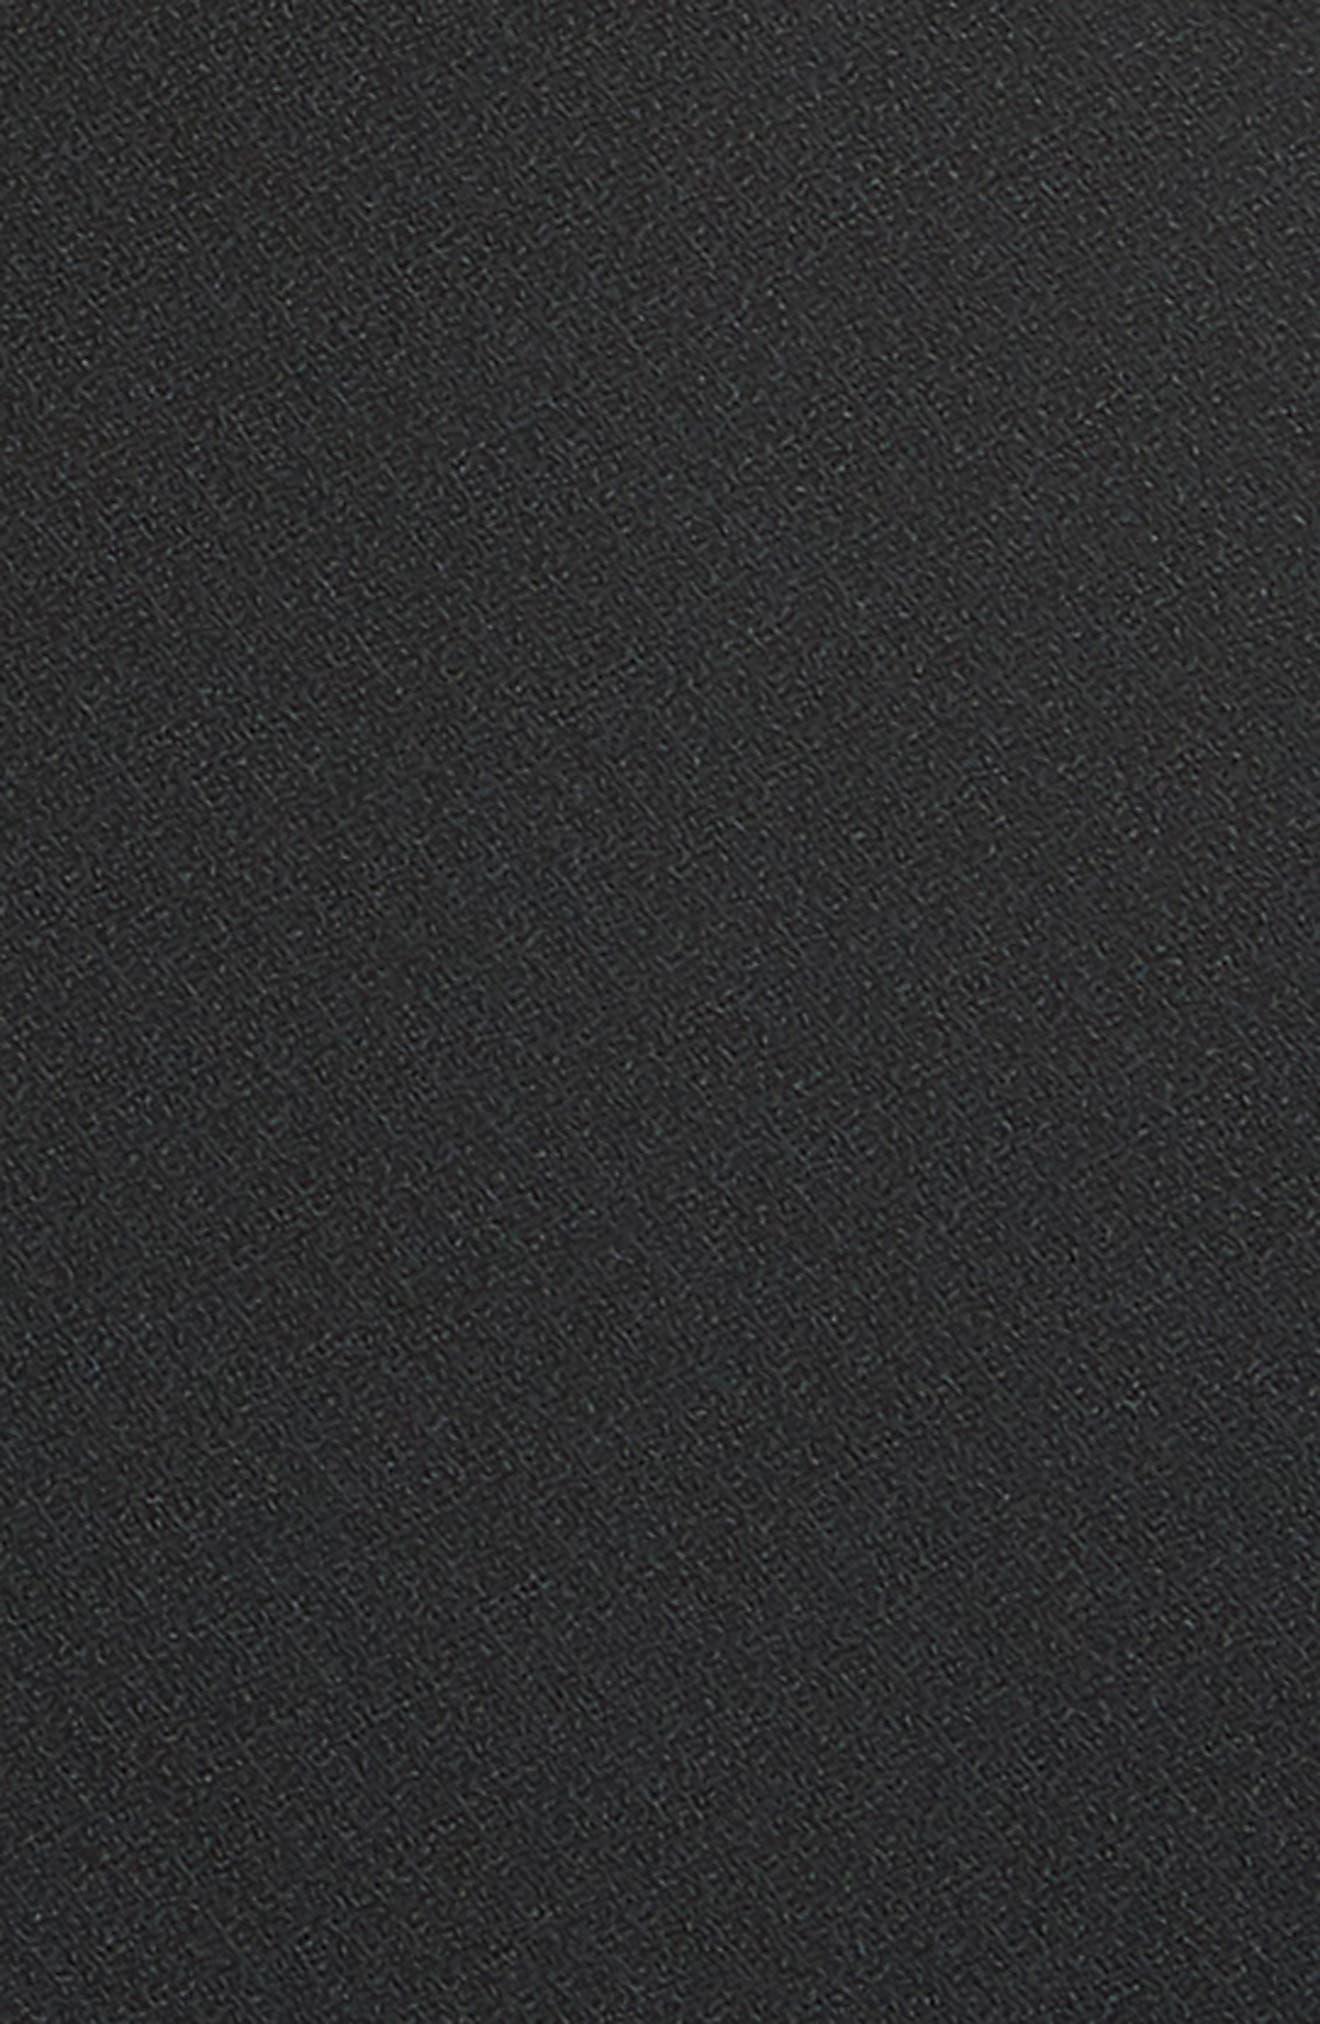 Arcadia High Waist Pants,                             Alternate thumbnail 6, color,                             Black